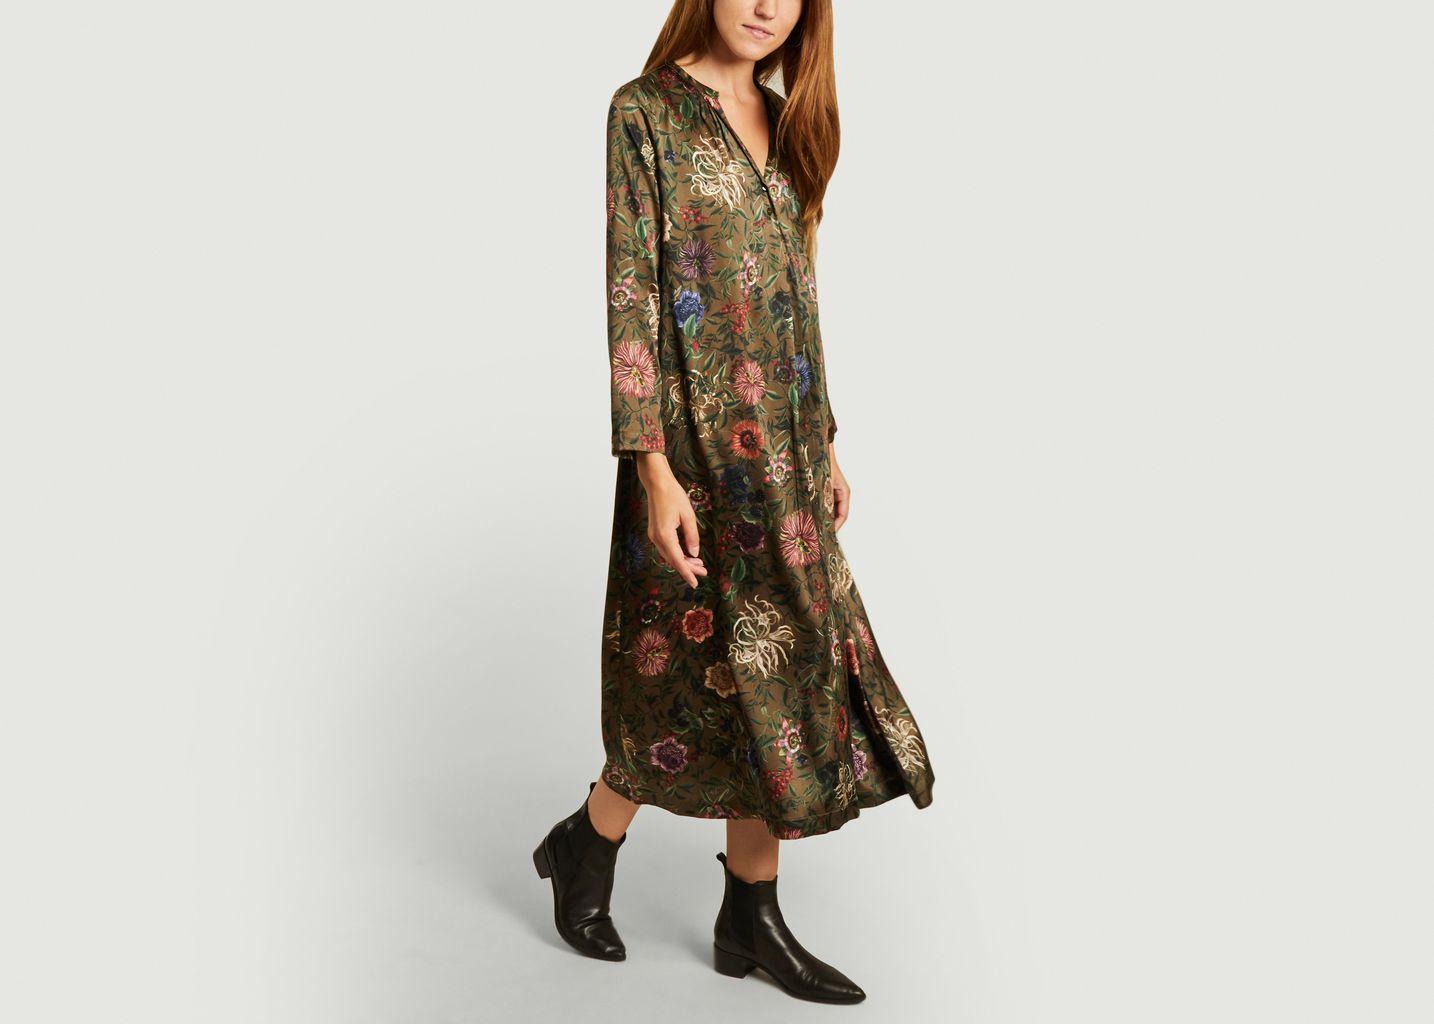 Robe en soie imprimé fleuri Cicinizza Bis - Momoni